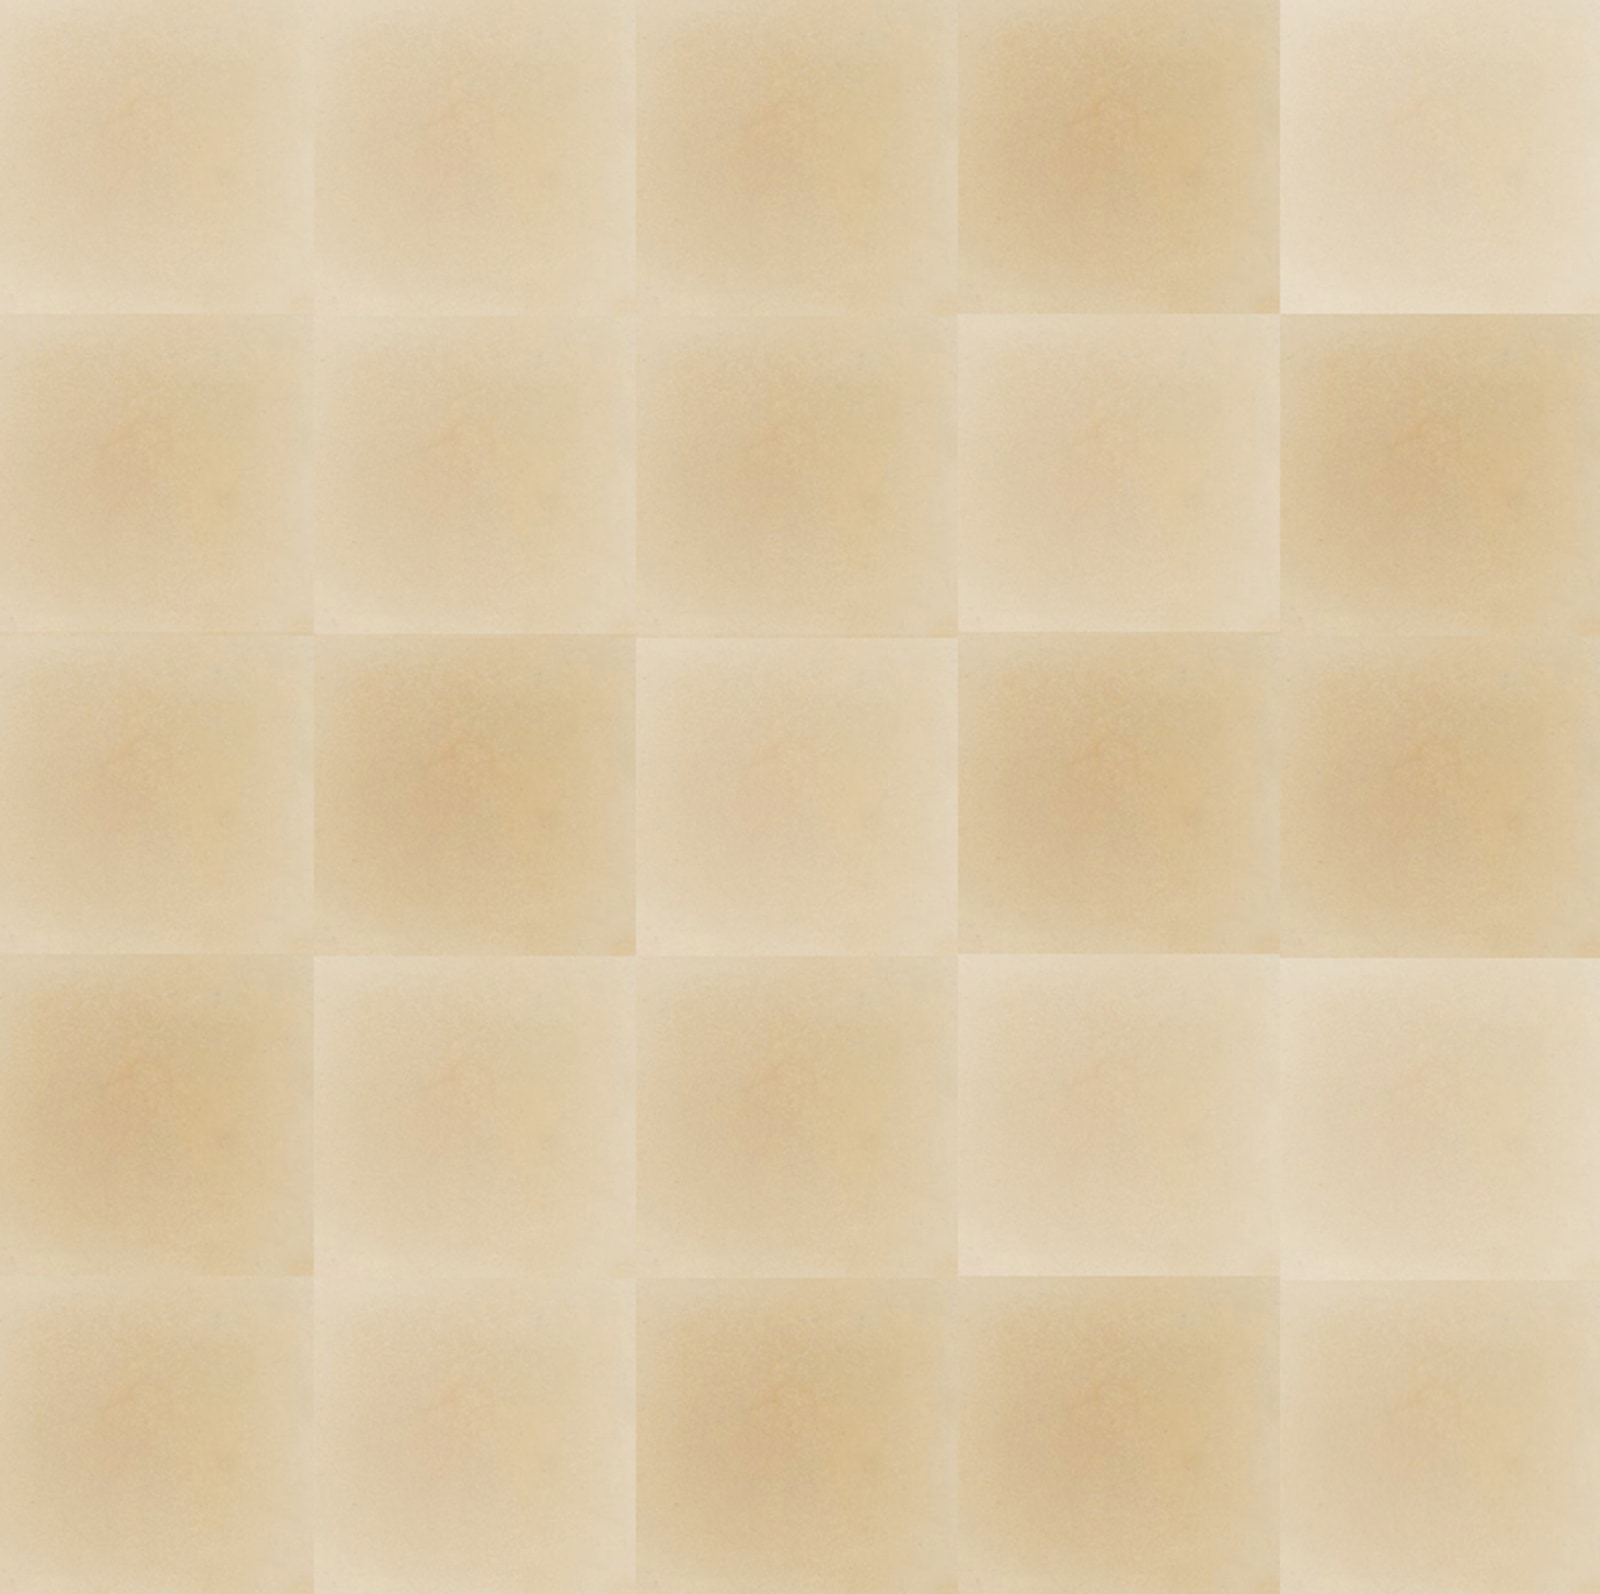 VIA_11_verlegt-viaplatten | 11/170